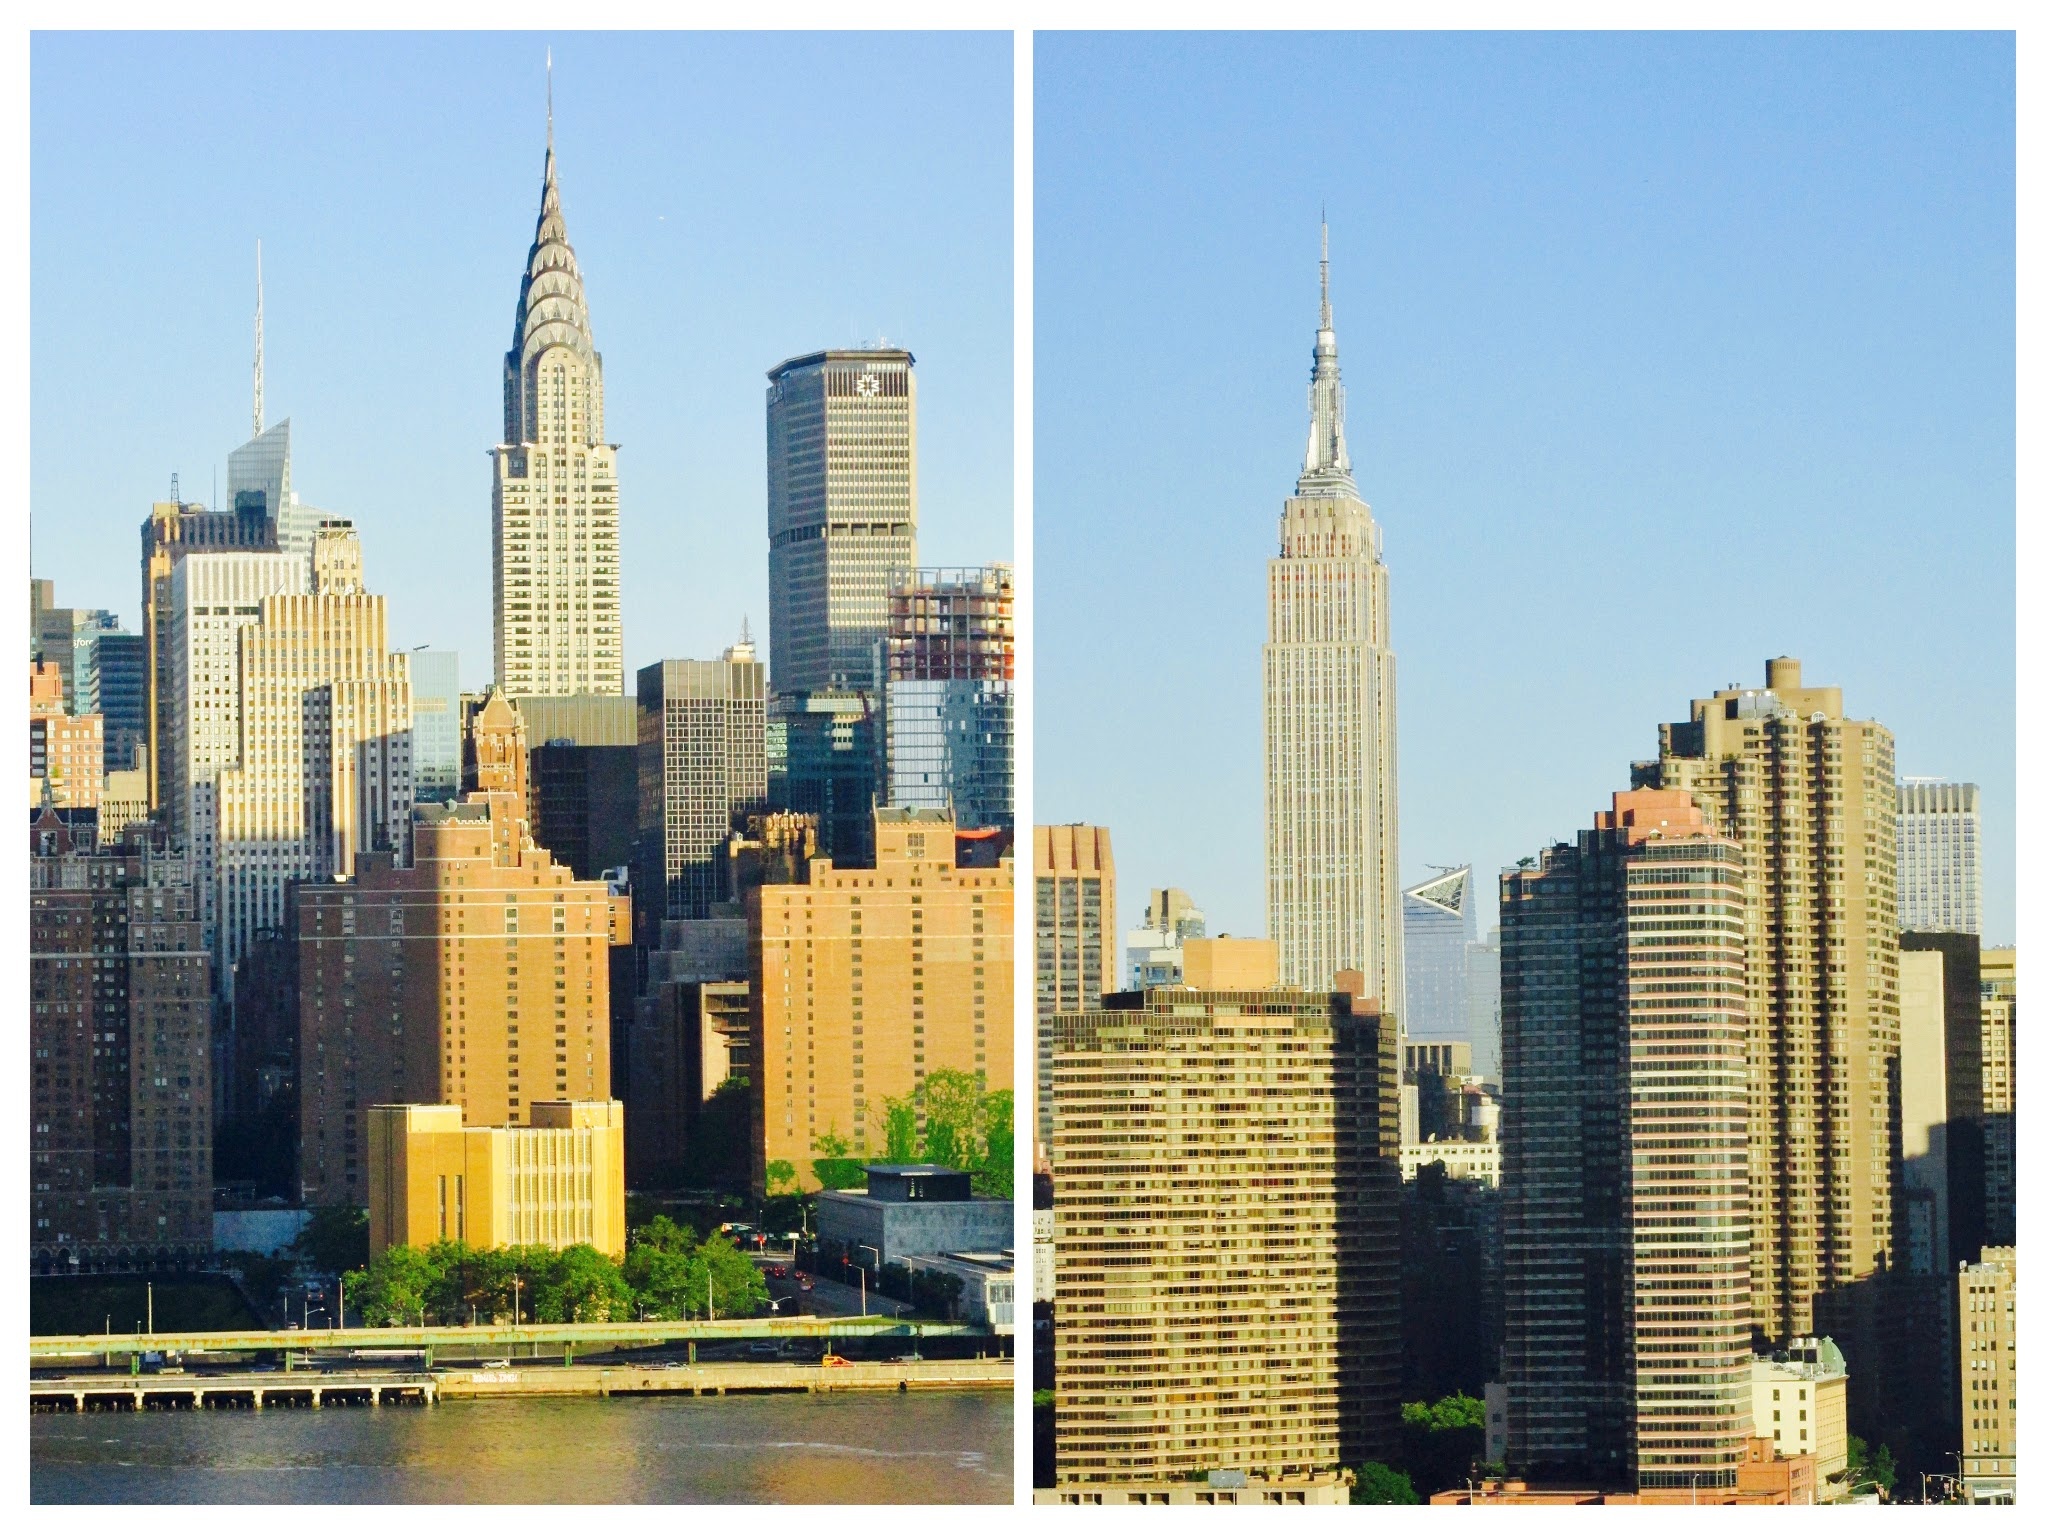 Urban Treetops - New York